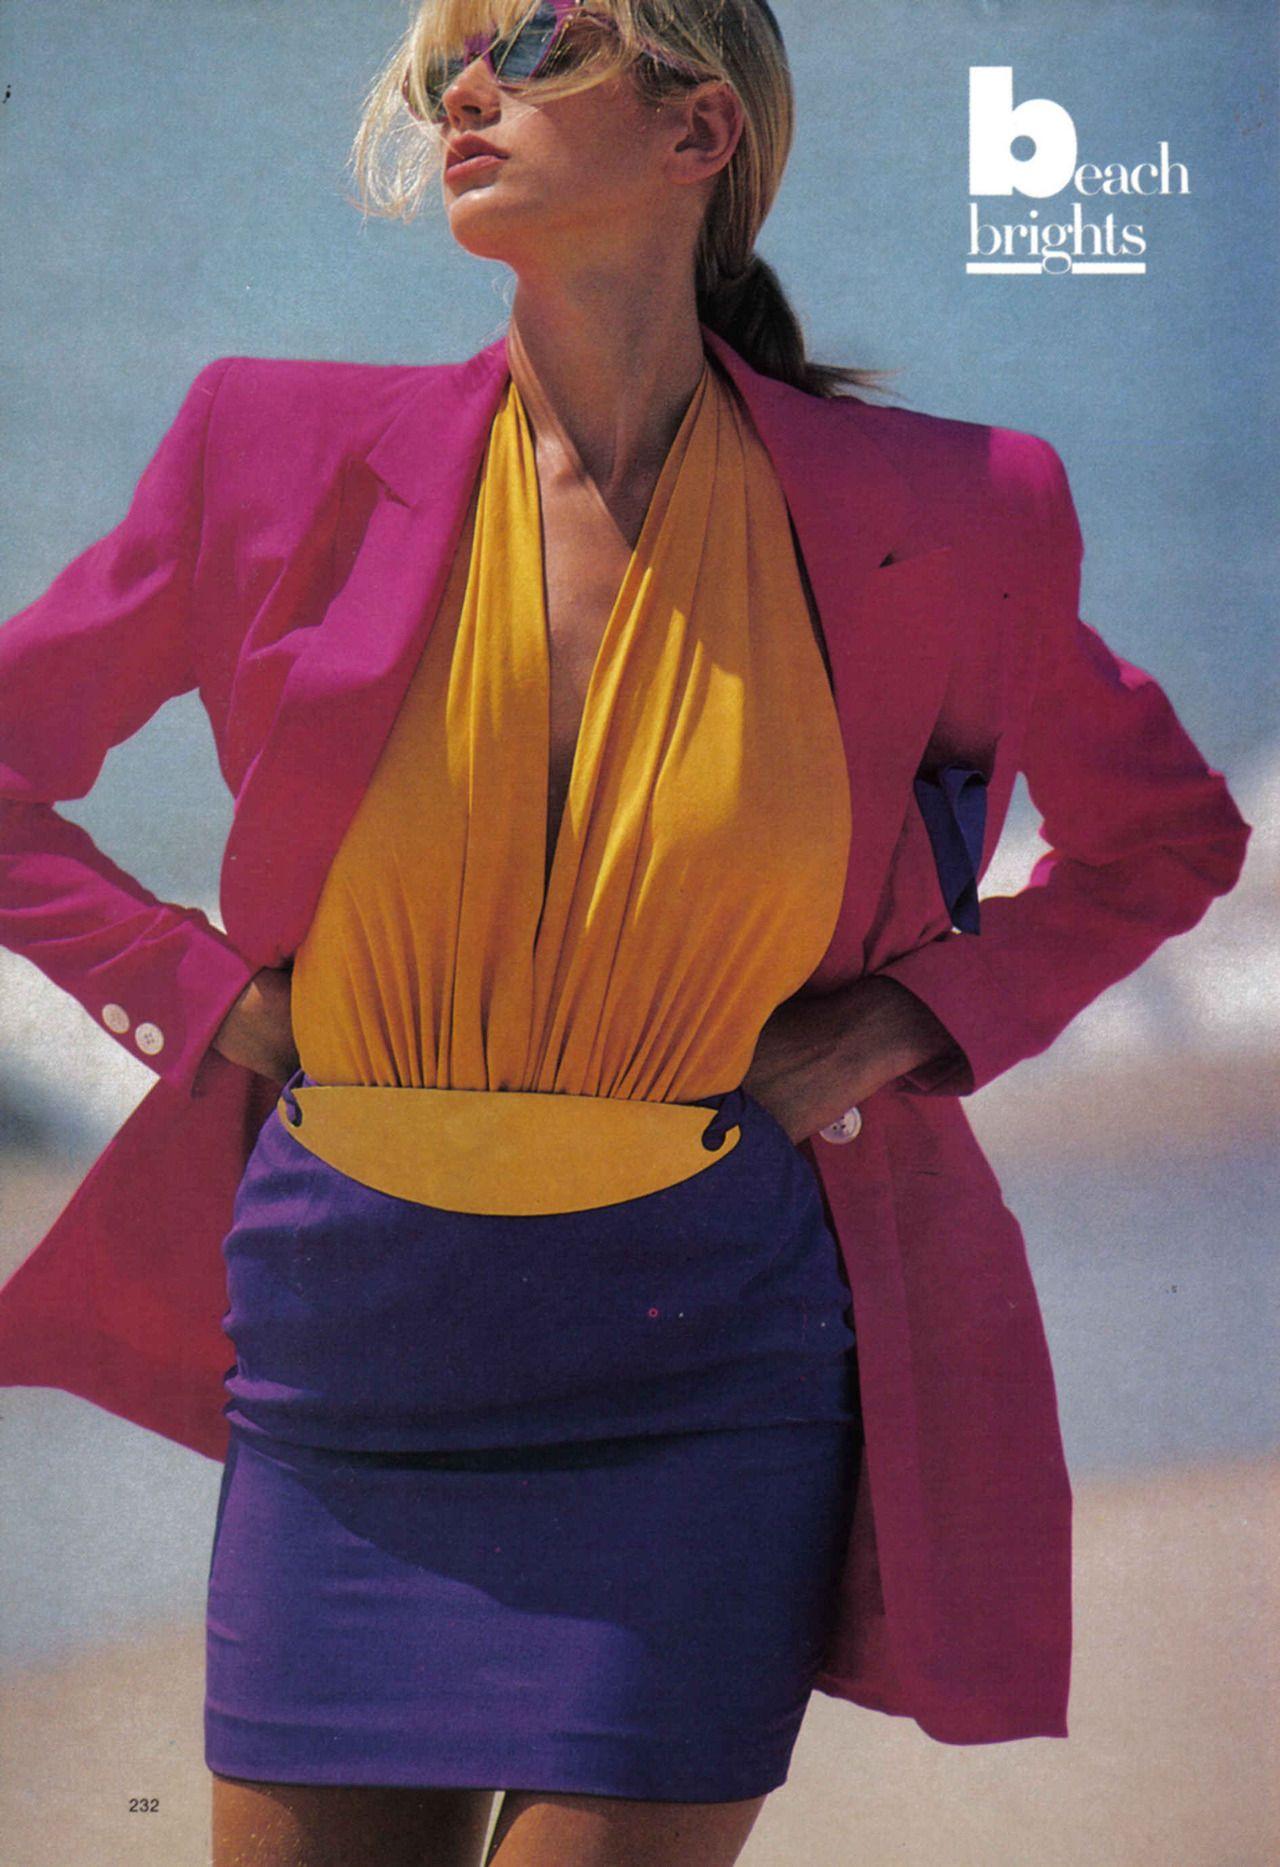 Beach brights vogue us late 80sphotographer rico puhlmannmodel ashley richardson my styl - 80er damenmode ...